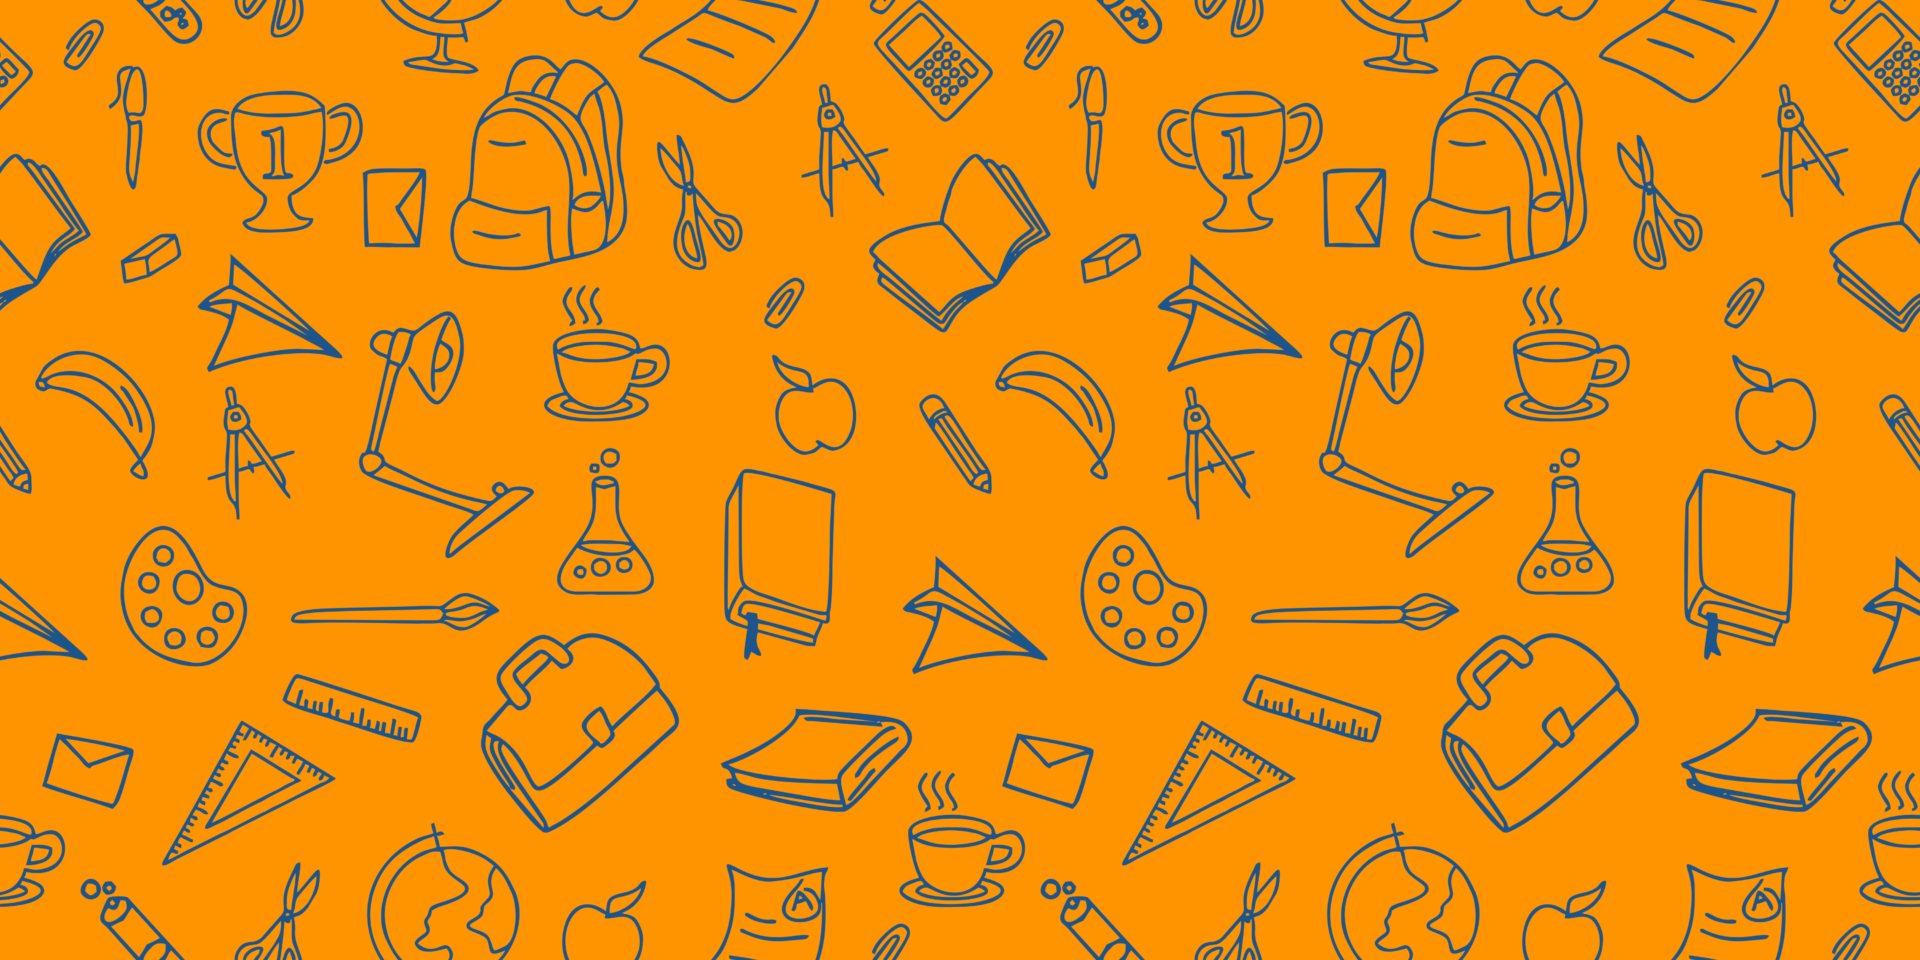 Collège et lycée – Manuels et fournitures